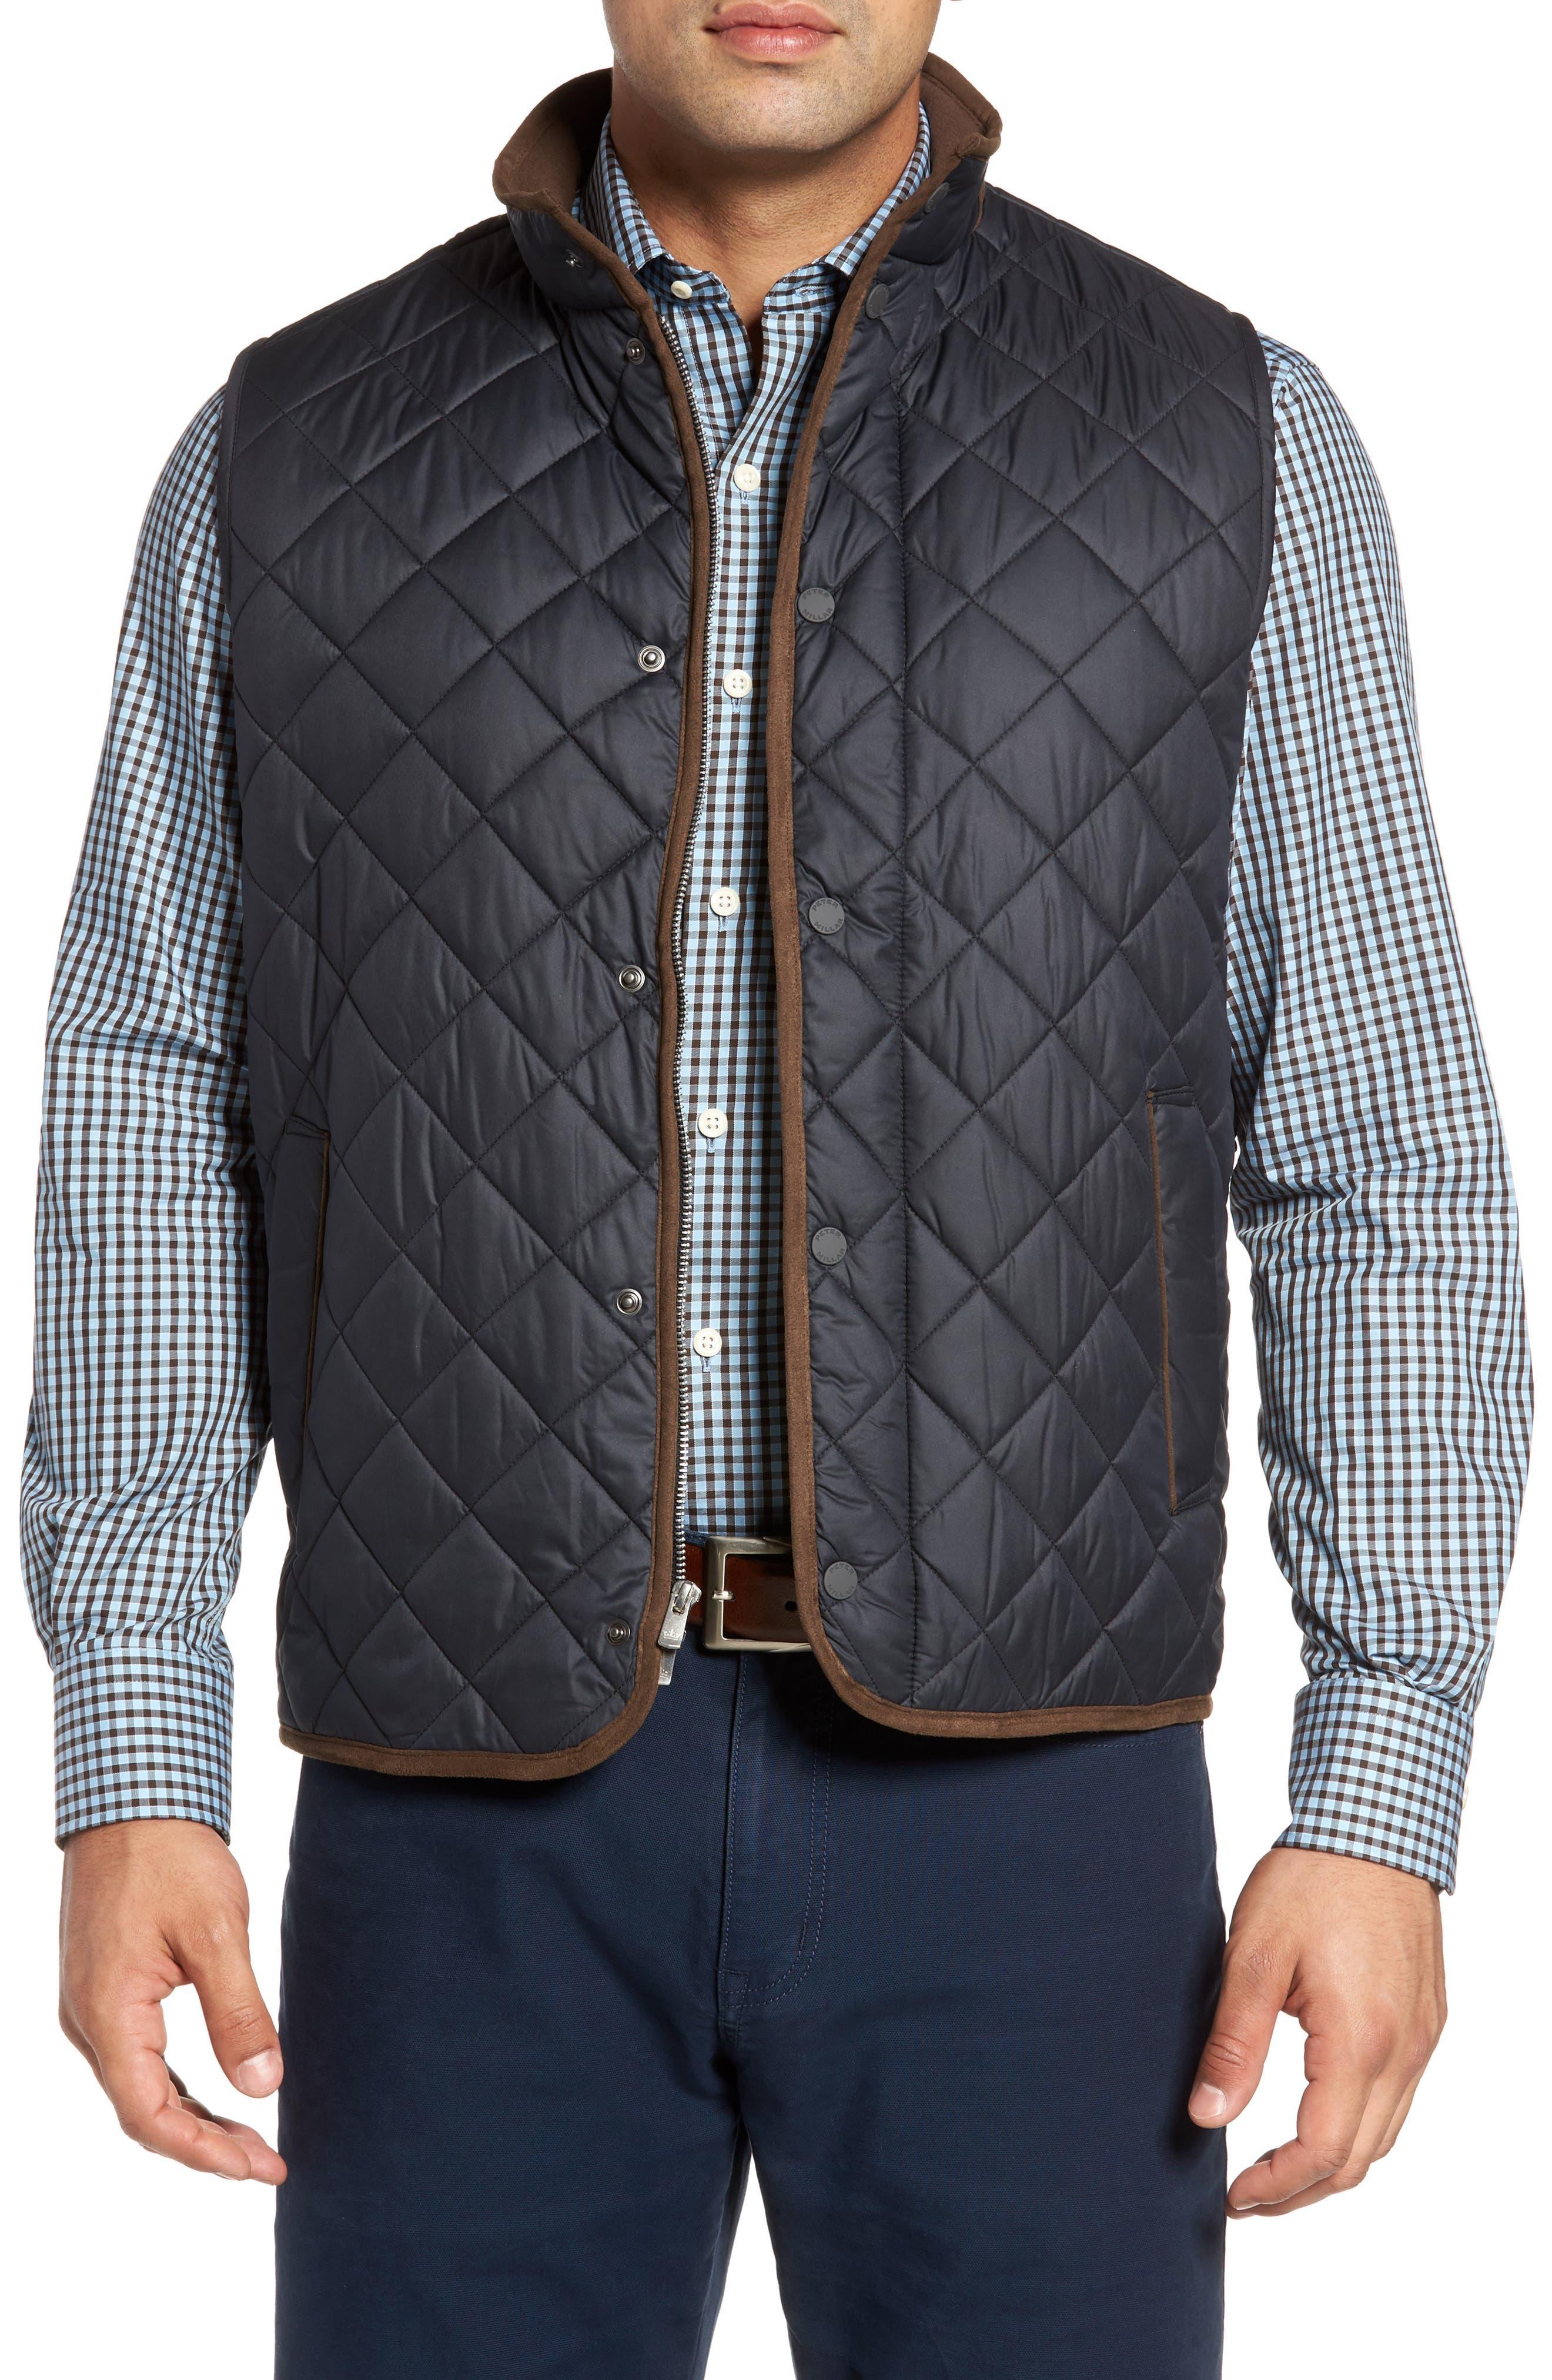 Essex Quilted Vest,                         Main,                         color, BLACK / BLACK